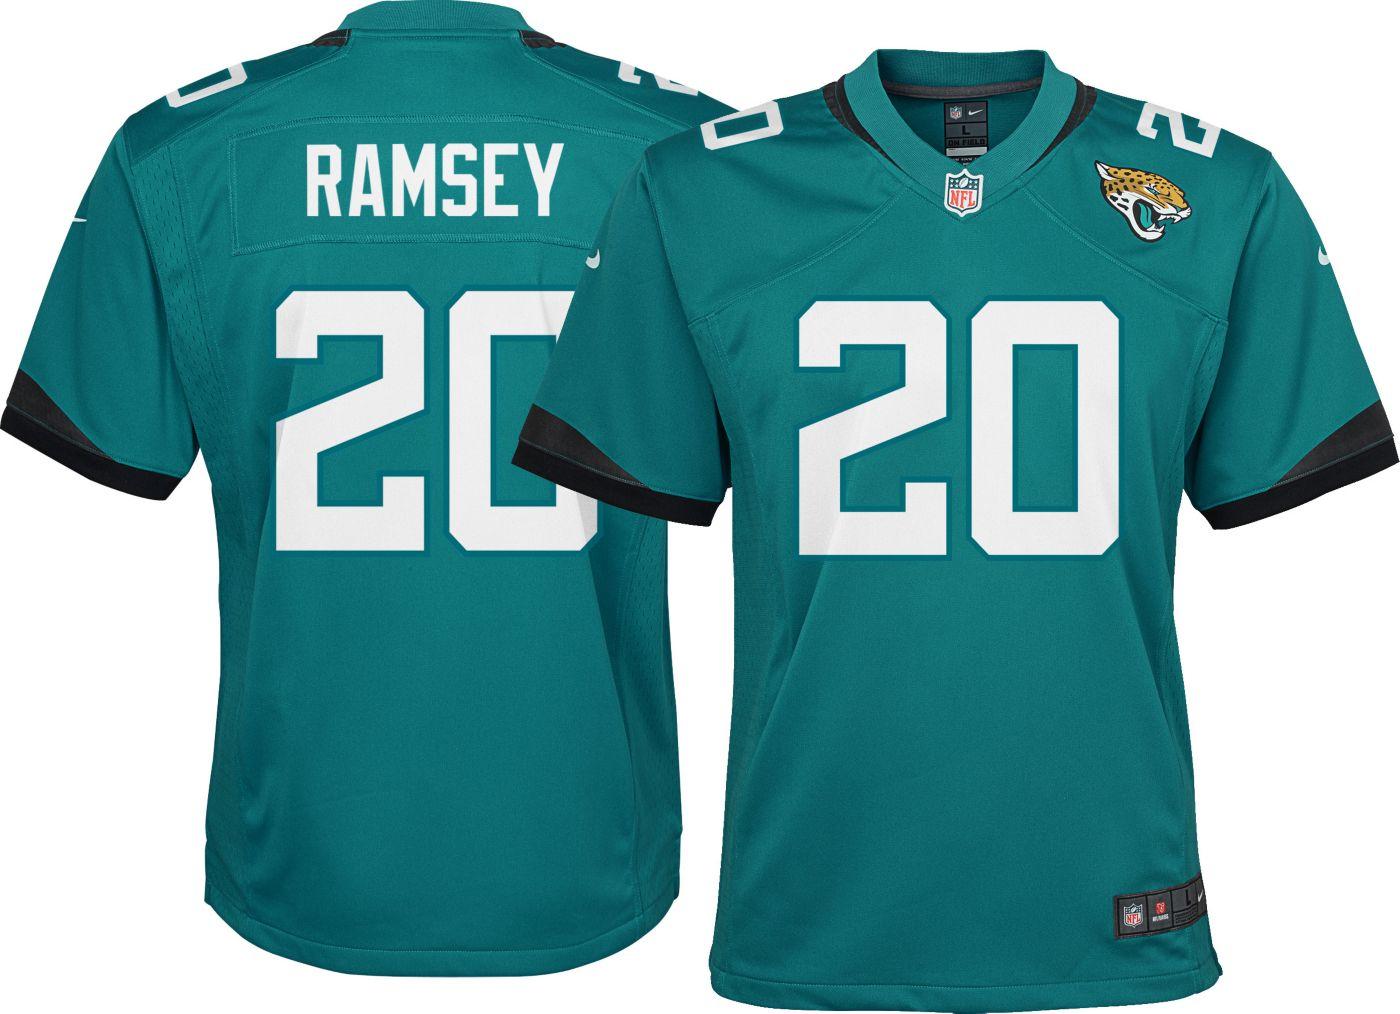 Nike Youth Alternate Game Jersey Jacksonville Jaguars Jalen Ramsey #20